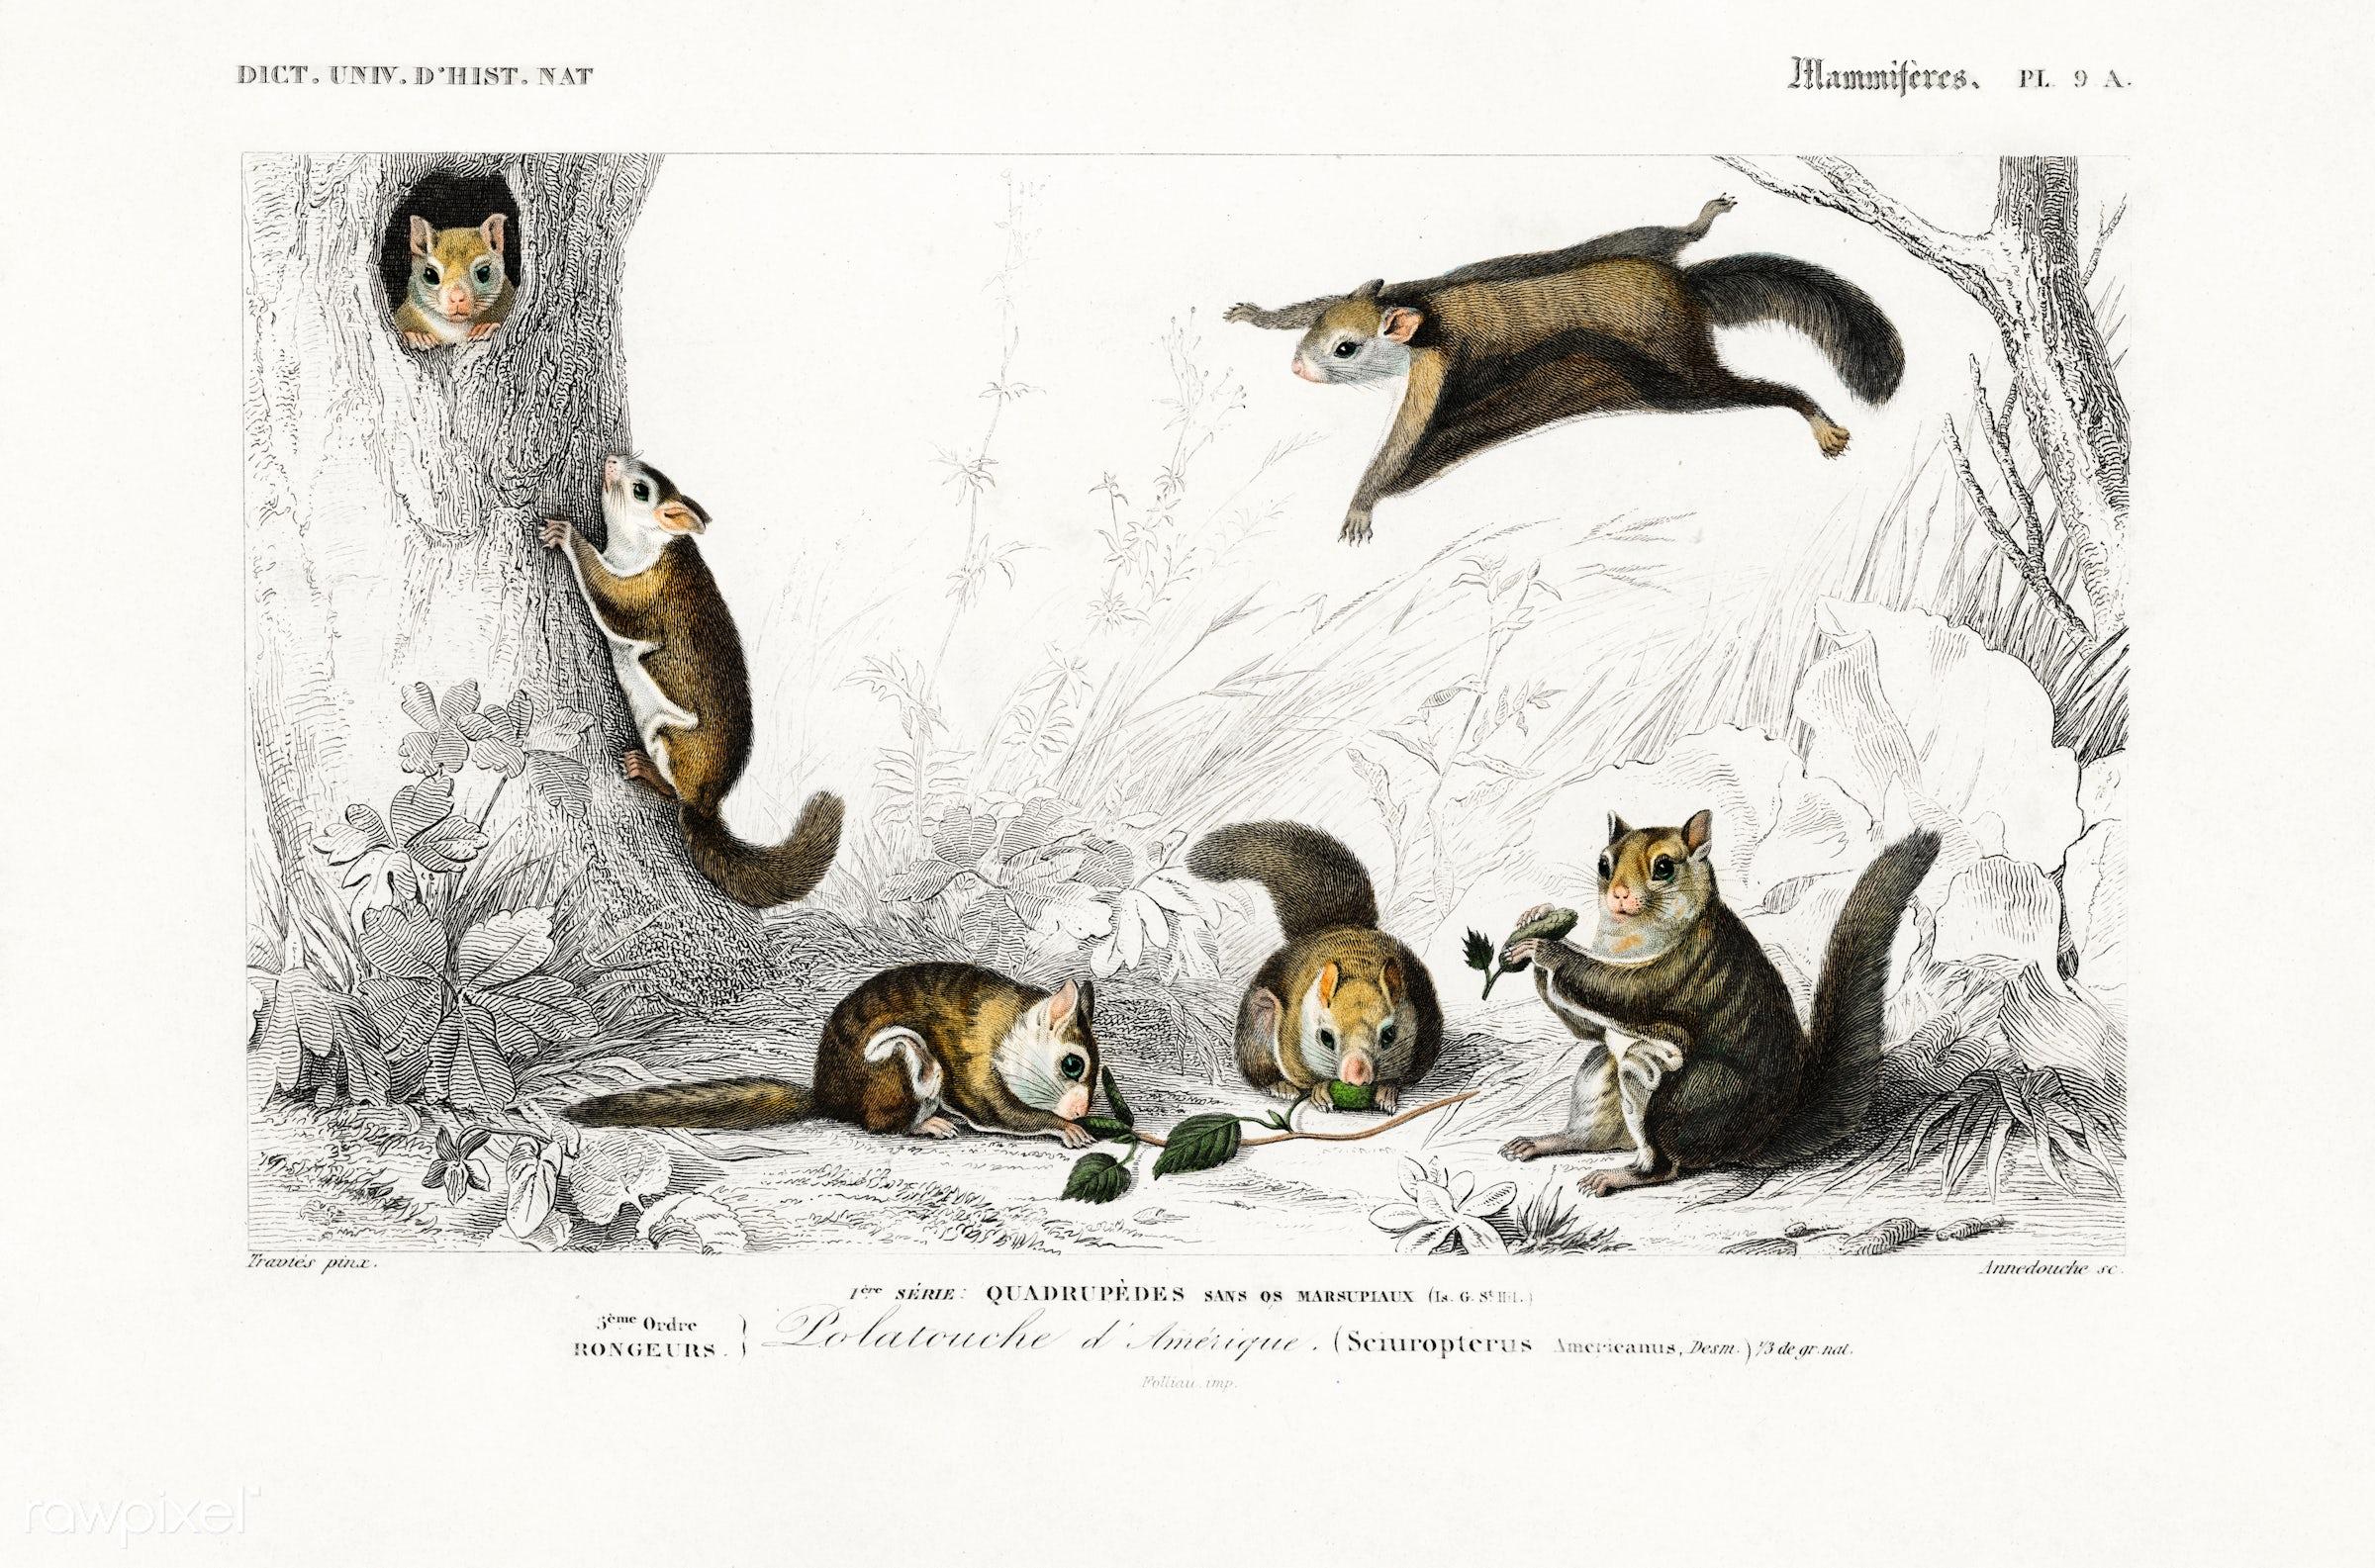 Glaucomys sabrinus (Polatouche D Amerique) illustrated by Charles Dessalines D' Orbigny (1806-1876). Digitally enhanced...